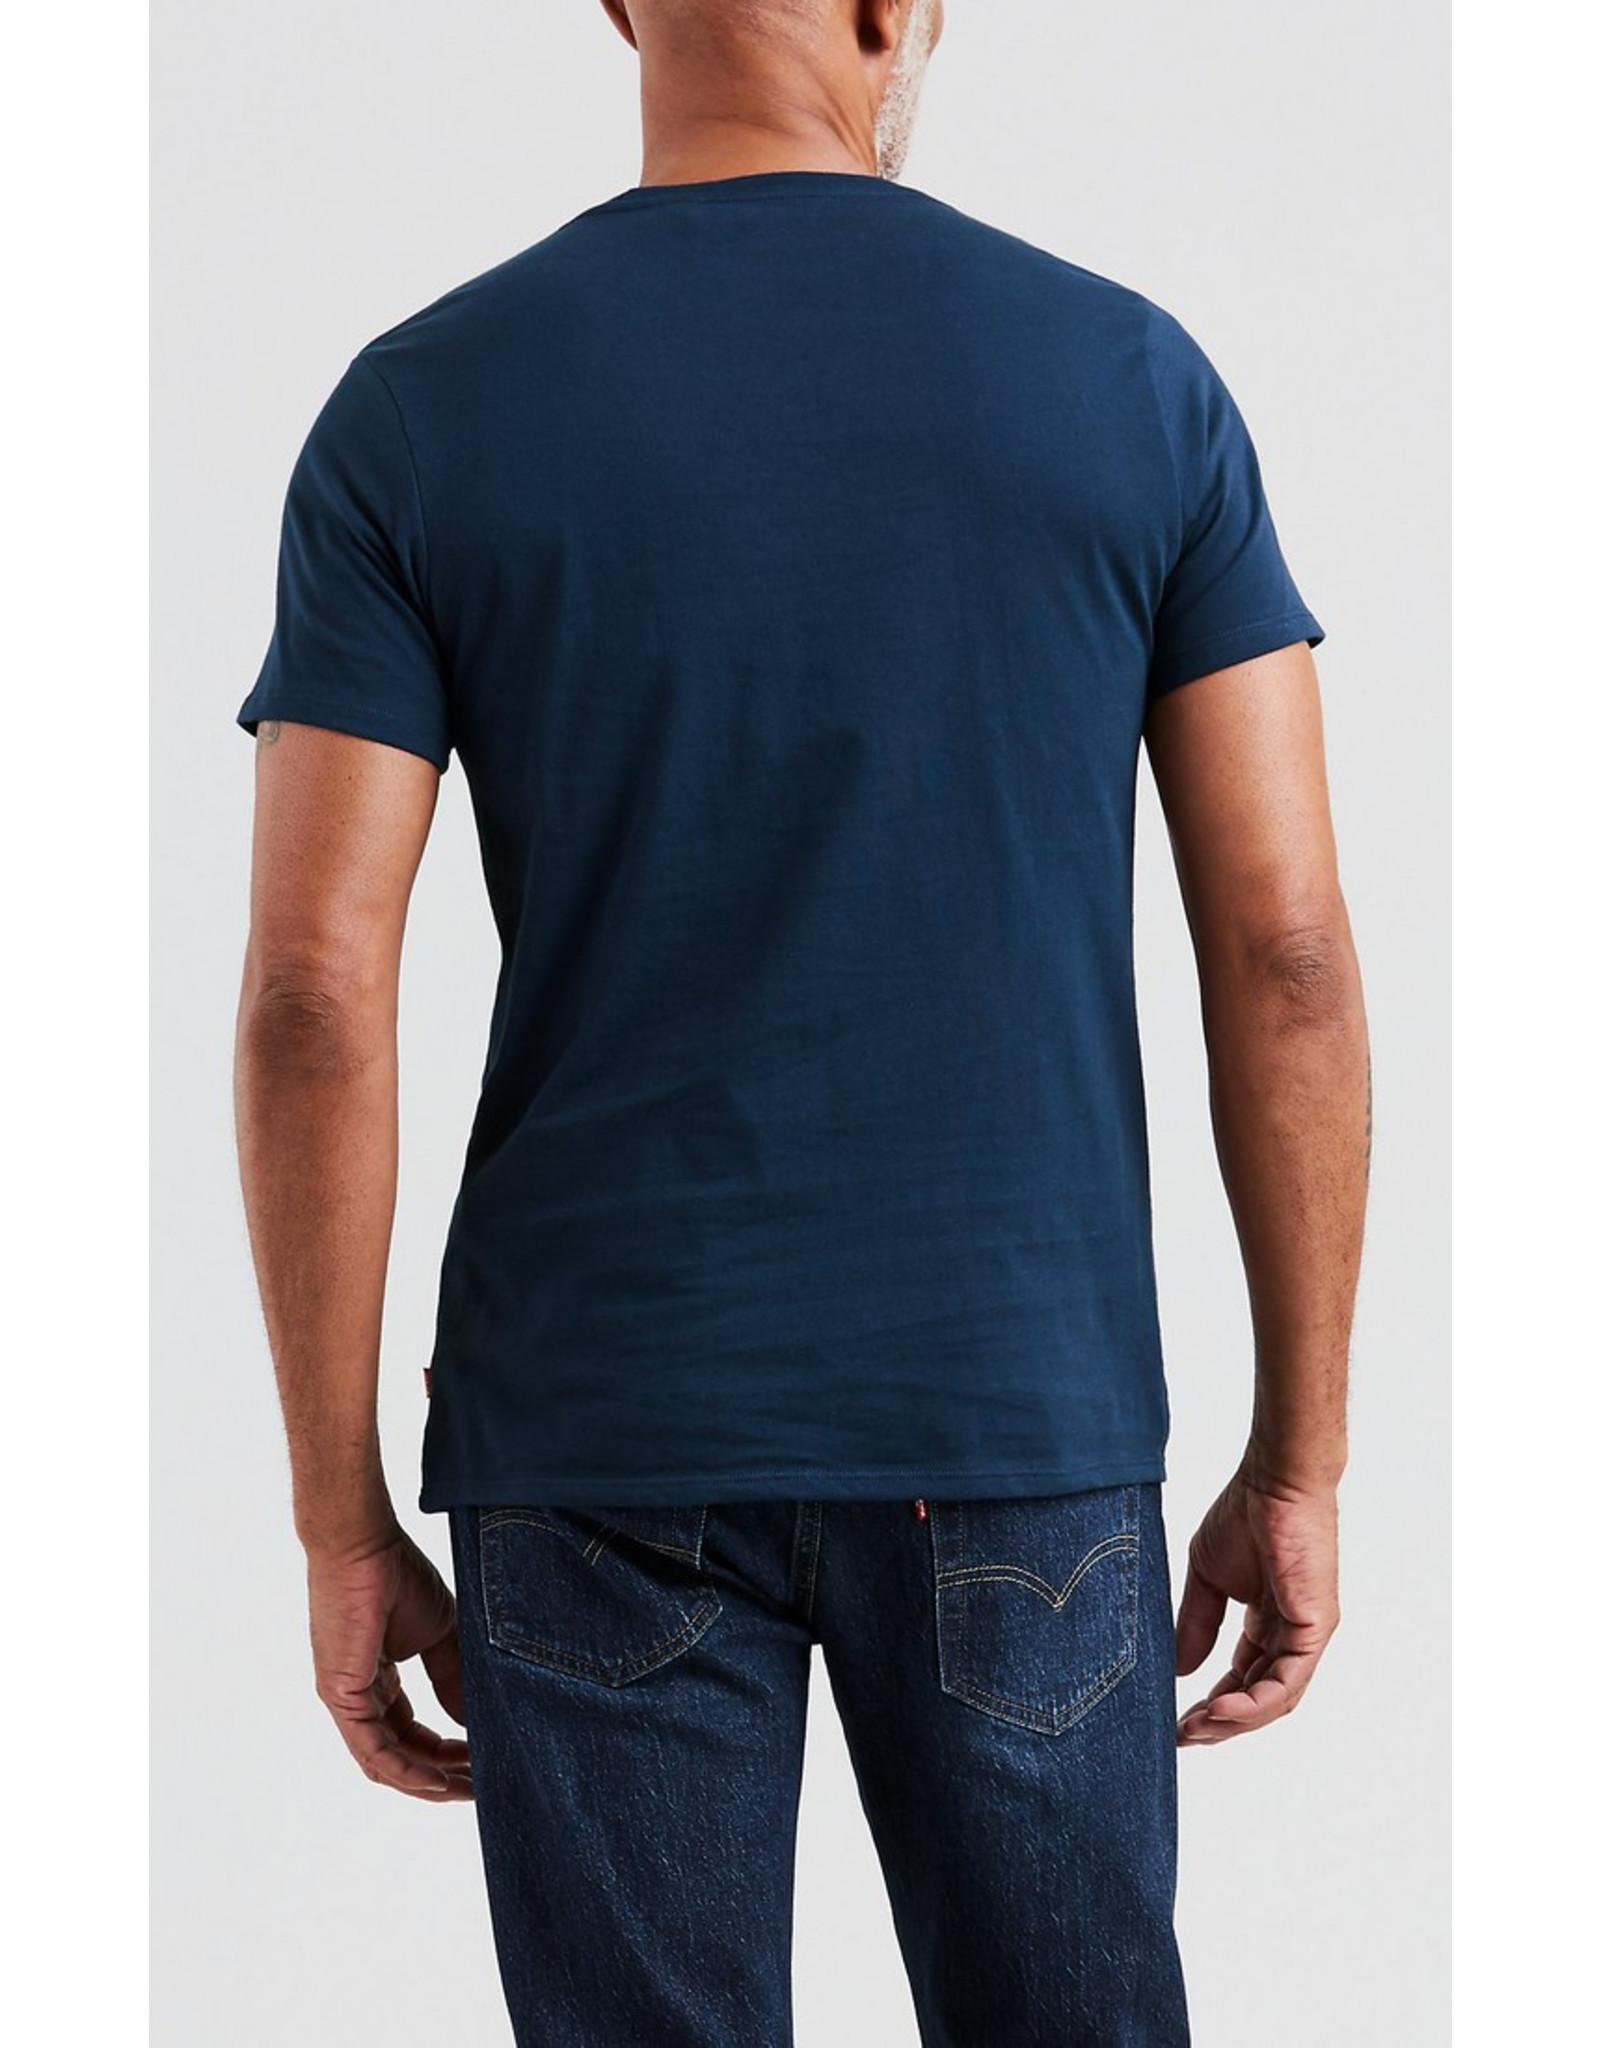 Levi's Levi's Graphic Set-In Neck T-Shirt